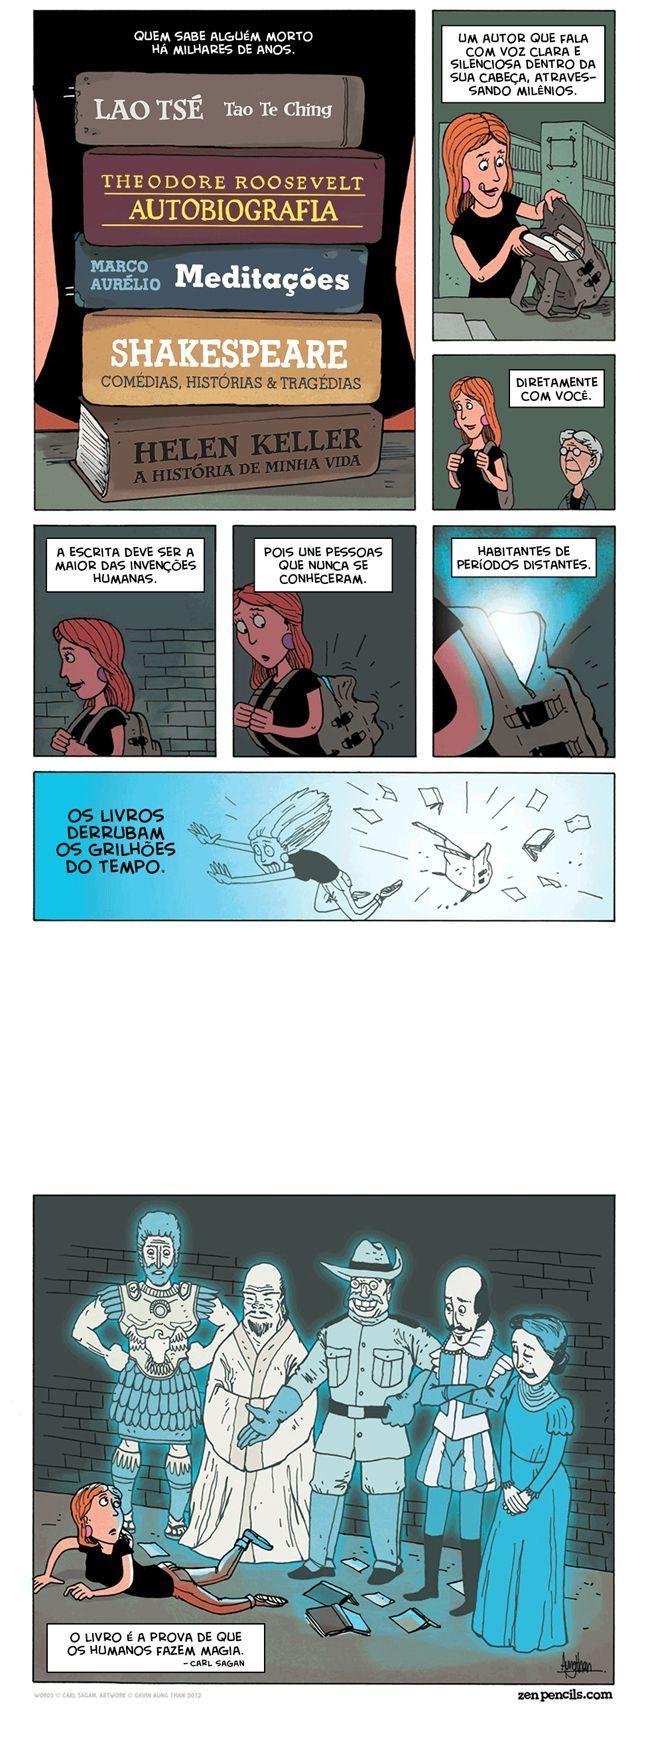 500 best EDUCAÇÃO images on Pinterest   Comic strips, Comics and ...